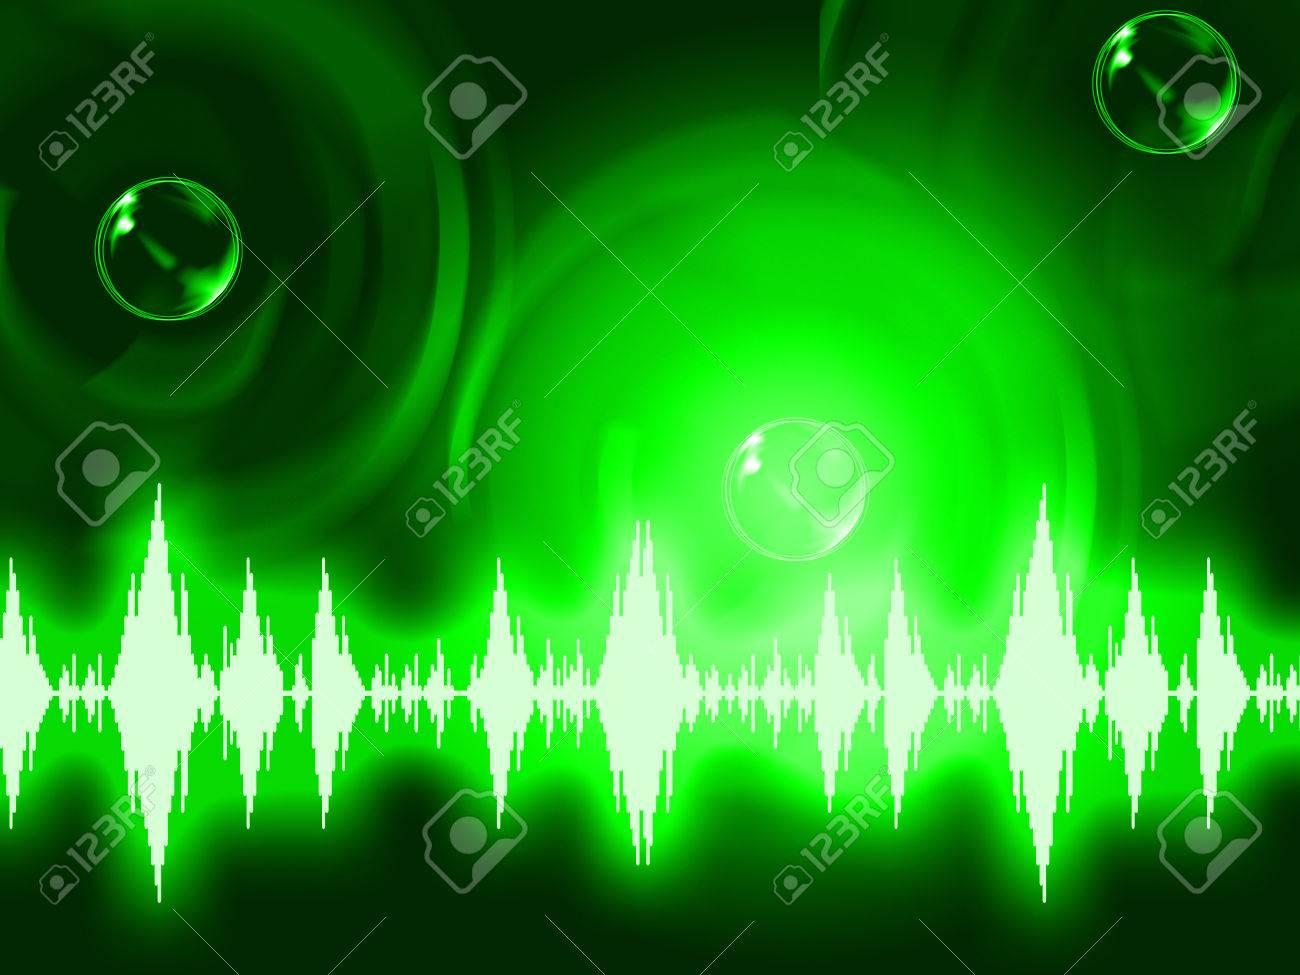 Fantastic Wallpaper Music Soundwave - 29632893-sound-wave-background-showing-glowing-background-or-equalizer-wallpaper  Pic_885261.jpg